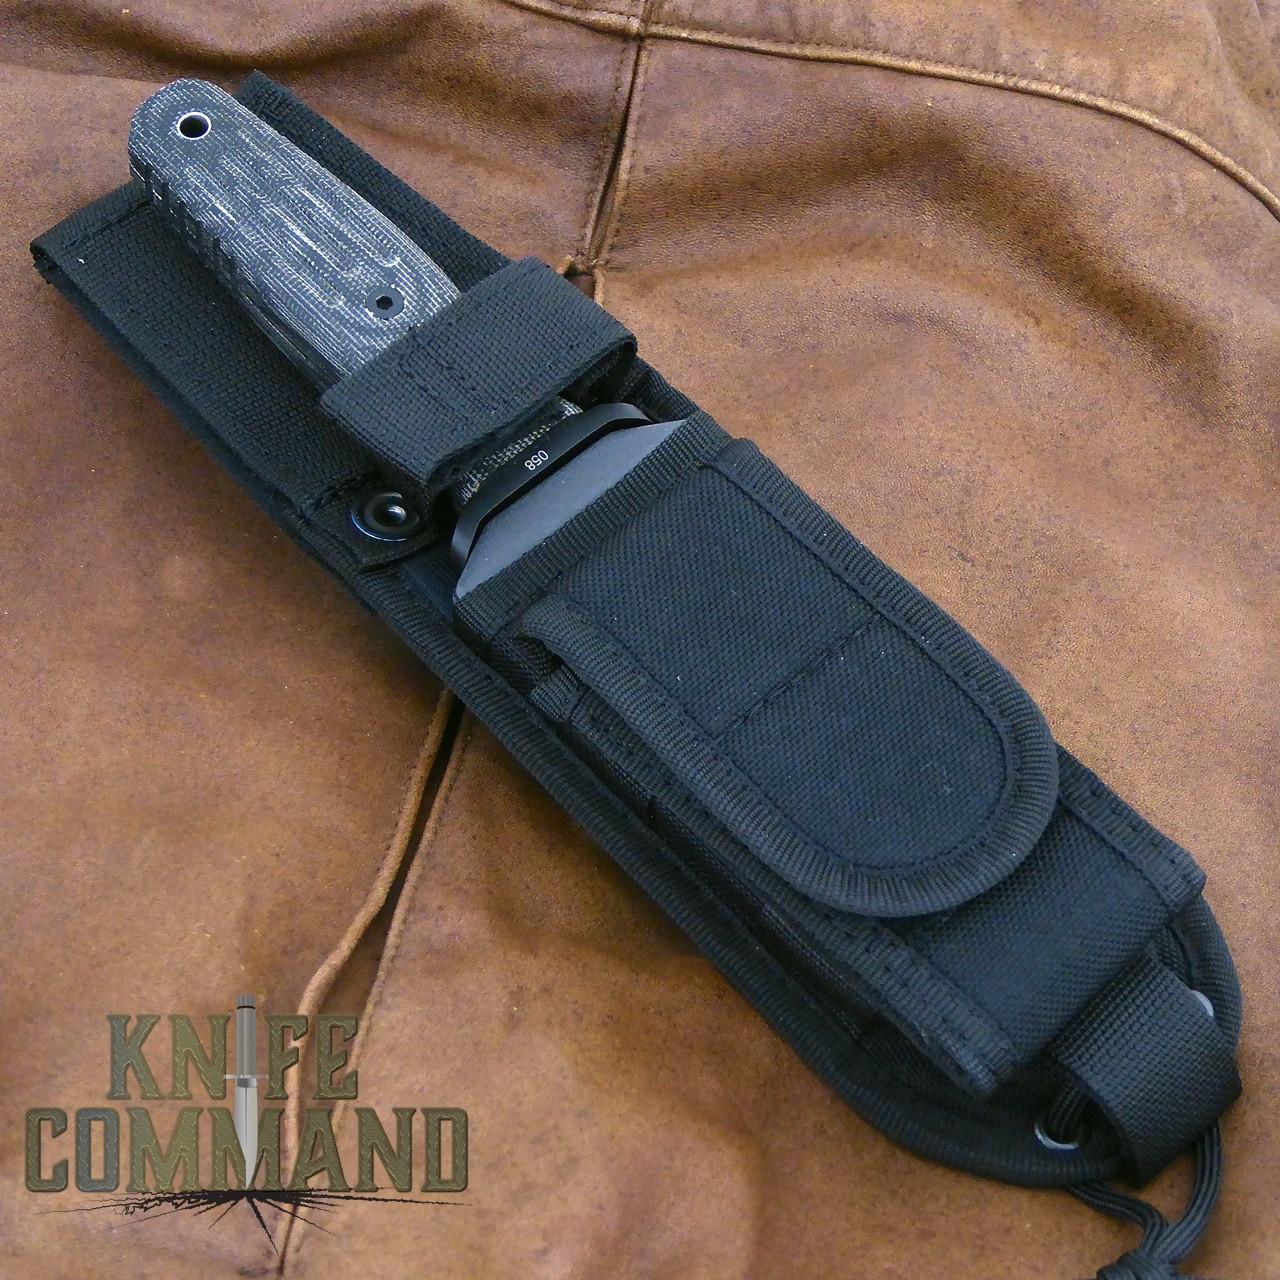 Boker Applegate-Fairbairn A-F 4.5 Black Harsey Combat Knife 121644.  Special Ops sheath.